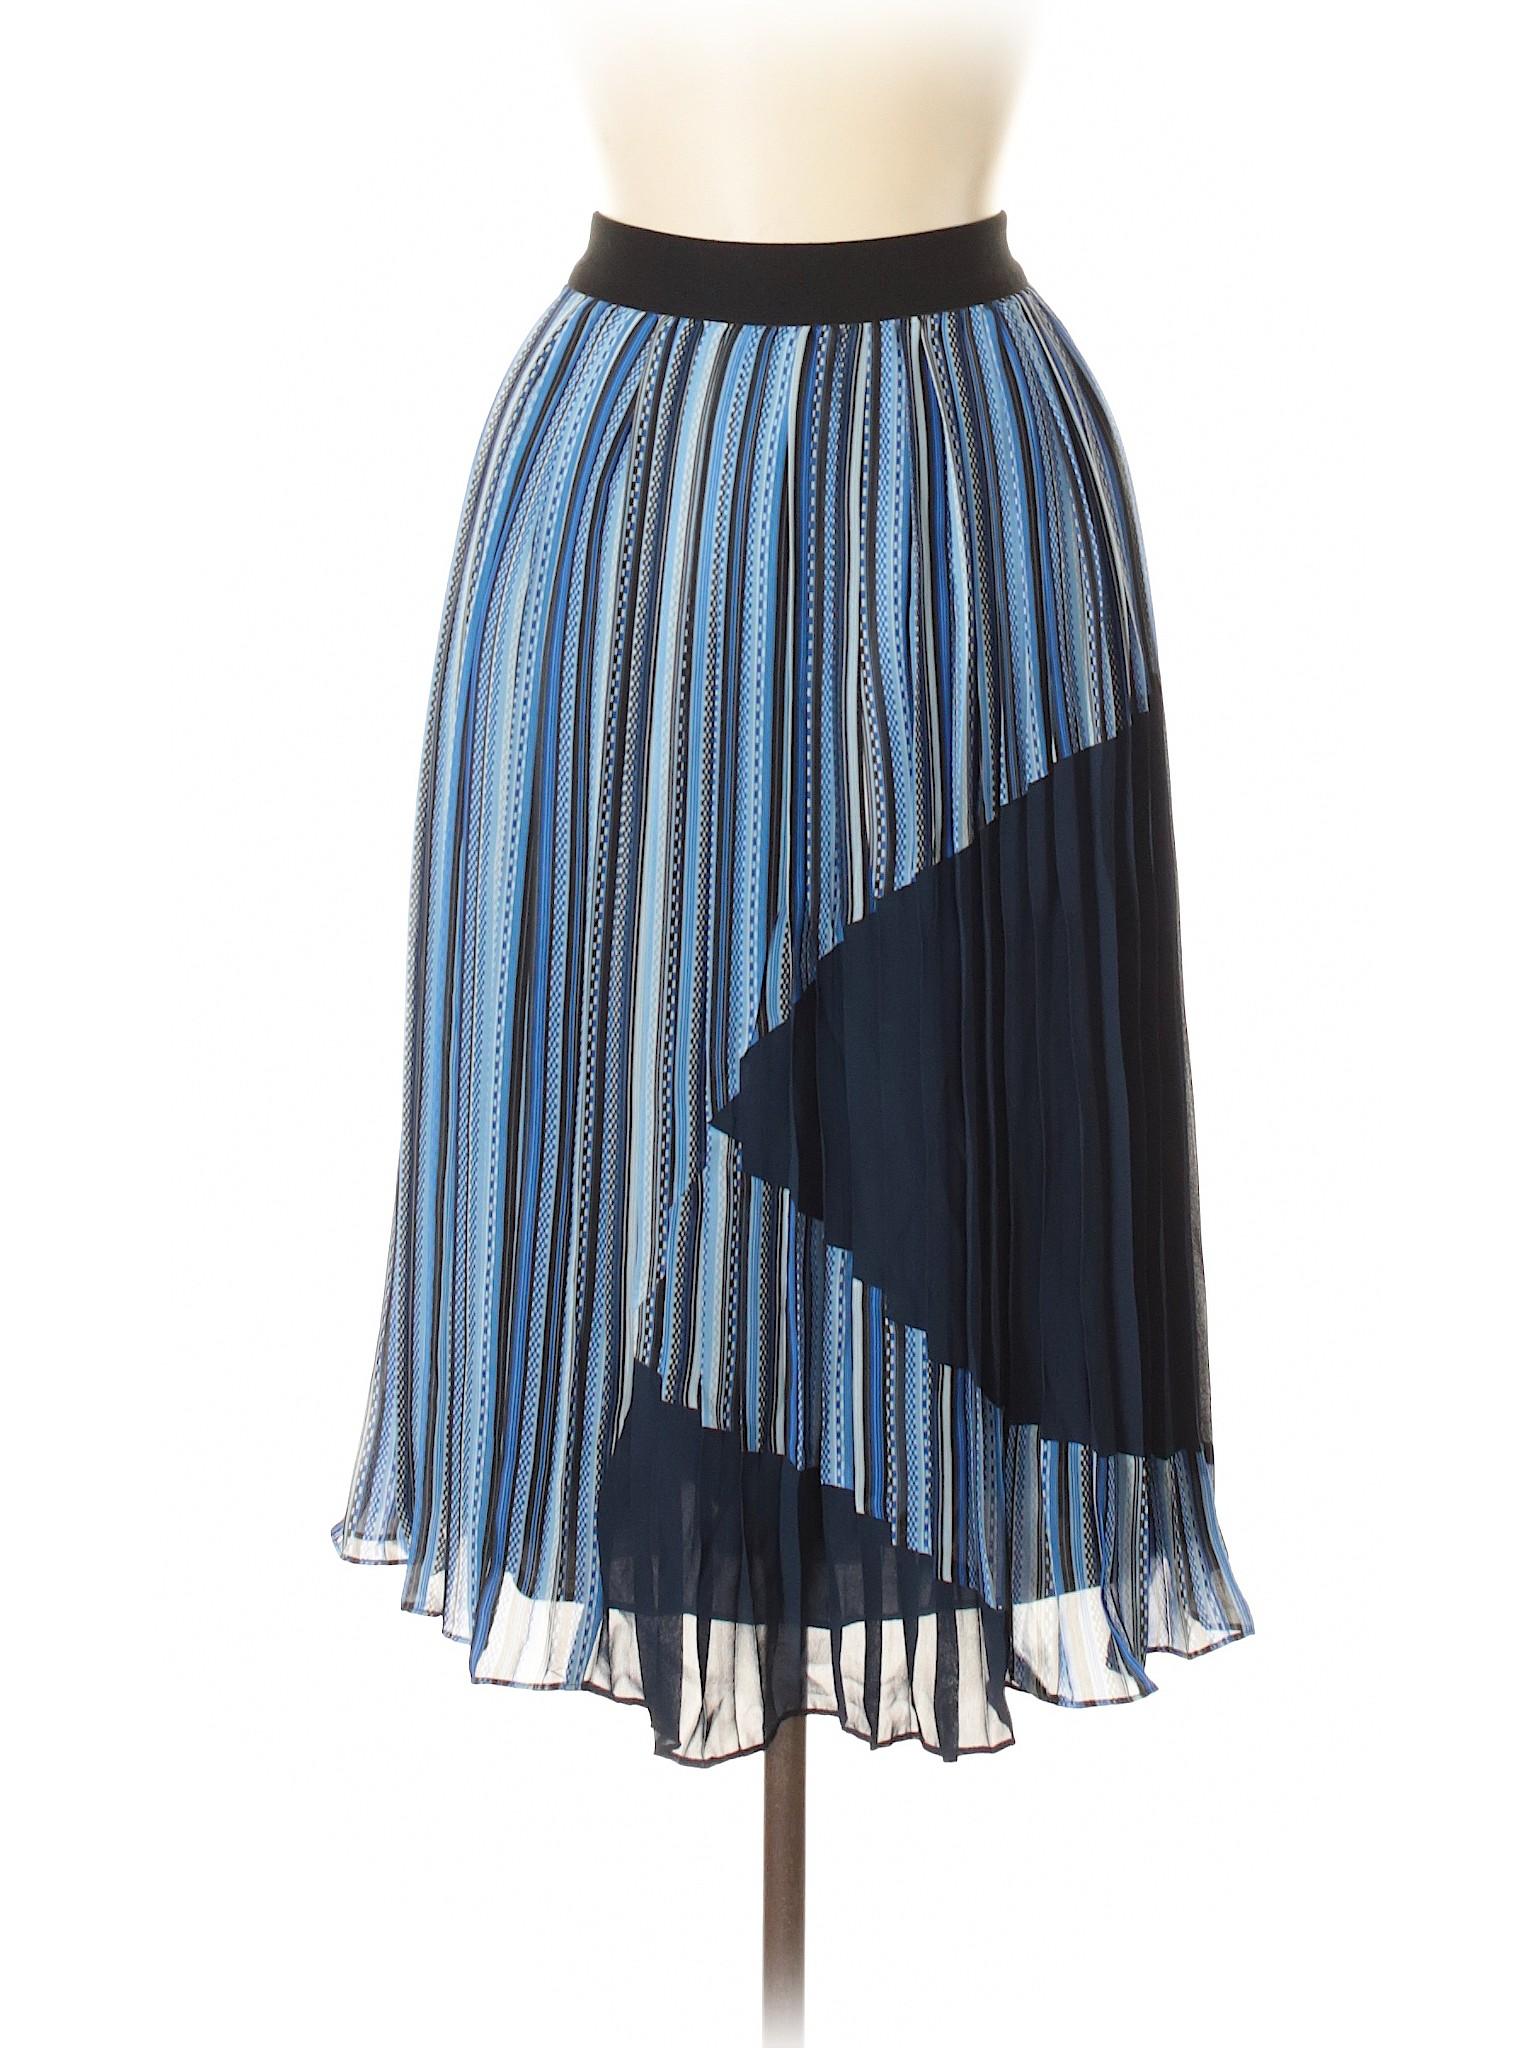 Boutique Boutique Casual Boutique Casual Skirt Skirt Boutique Skirt Skirt Casual Casual nOgYnaqxp